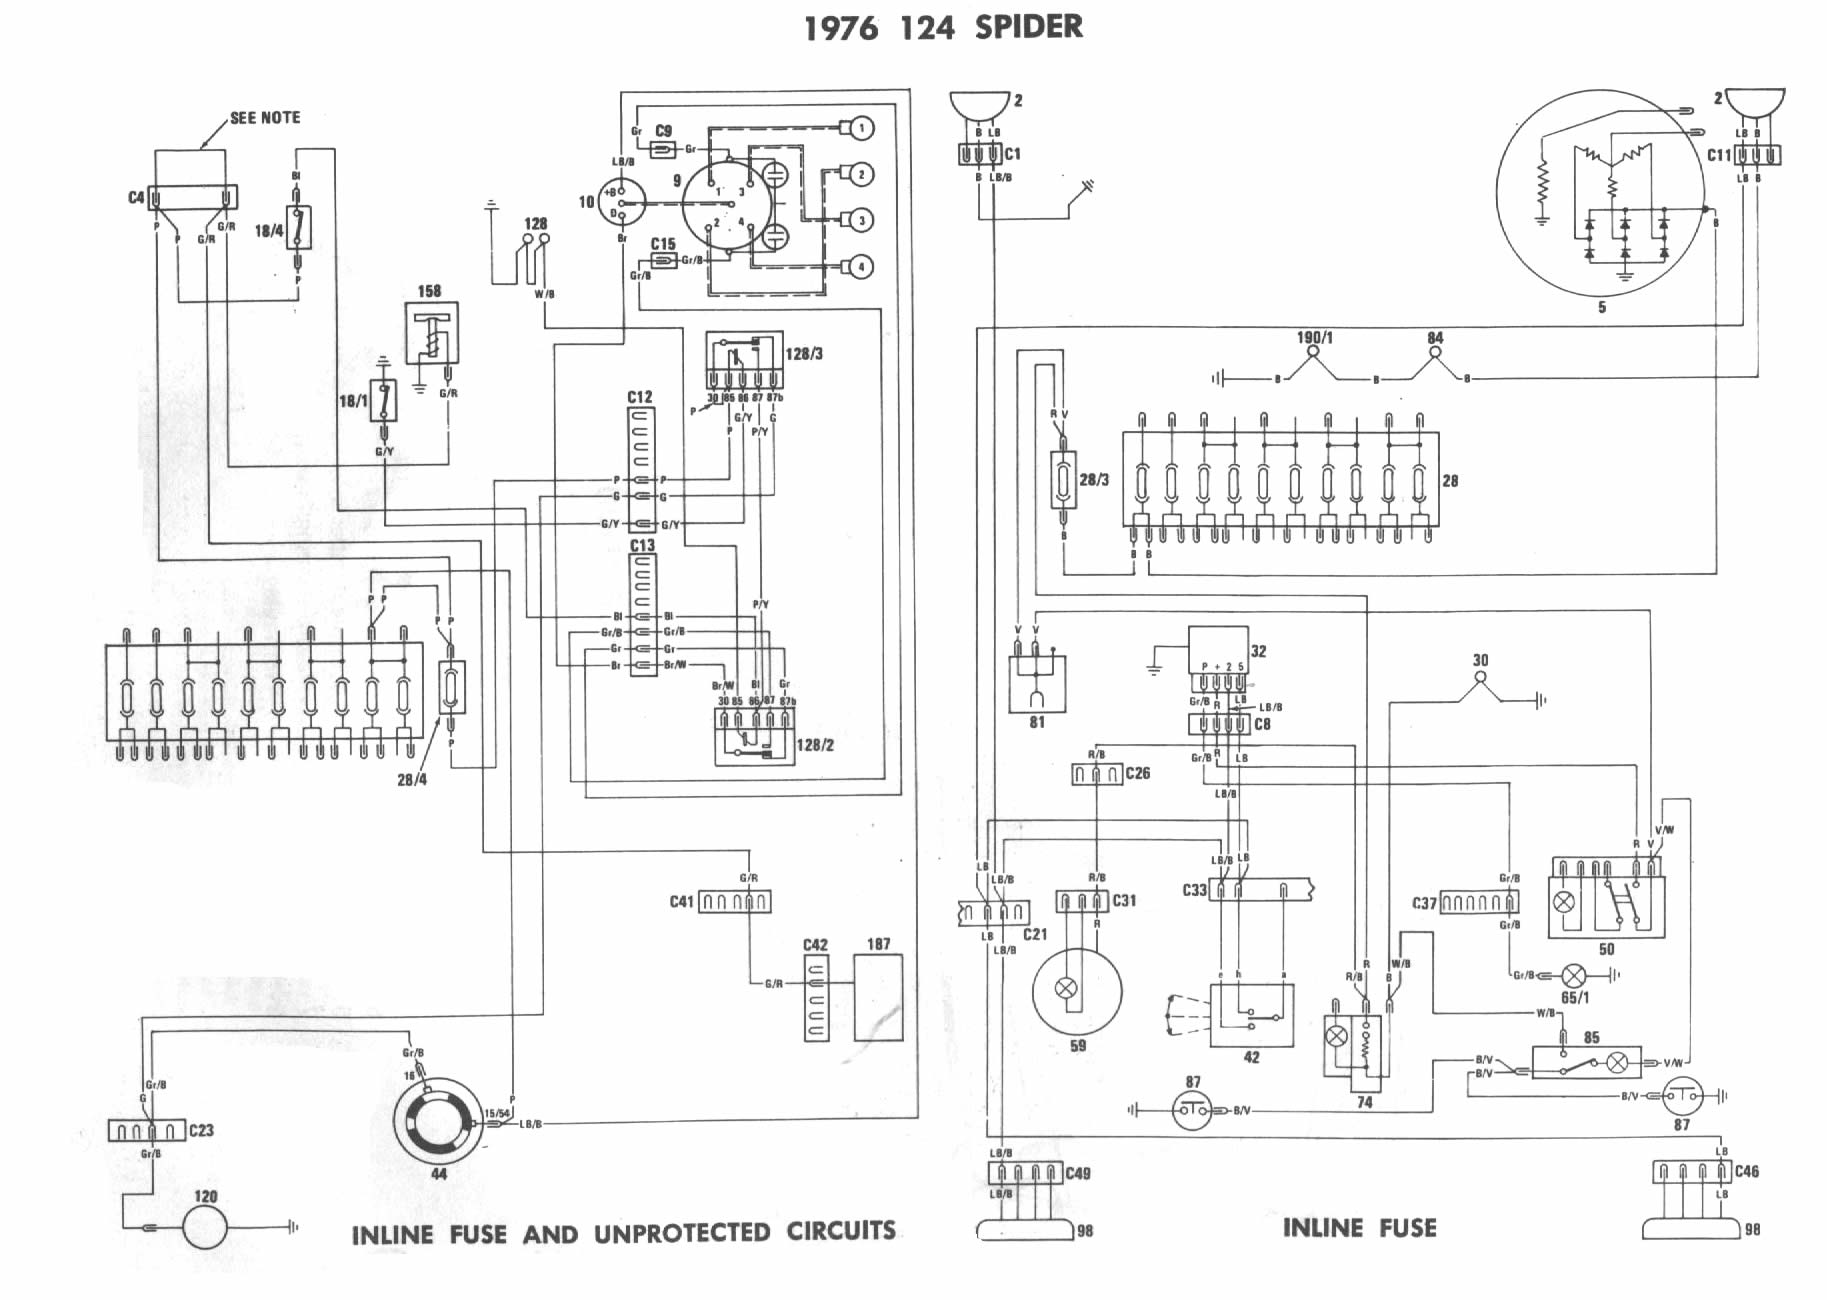 Fiat Multipla Wiring Diagram Pdf Schematic 2019 Fuse Box Car Manuals Diagrams Fault Codes Rh Automotive Net